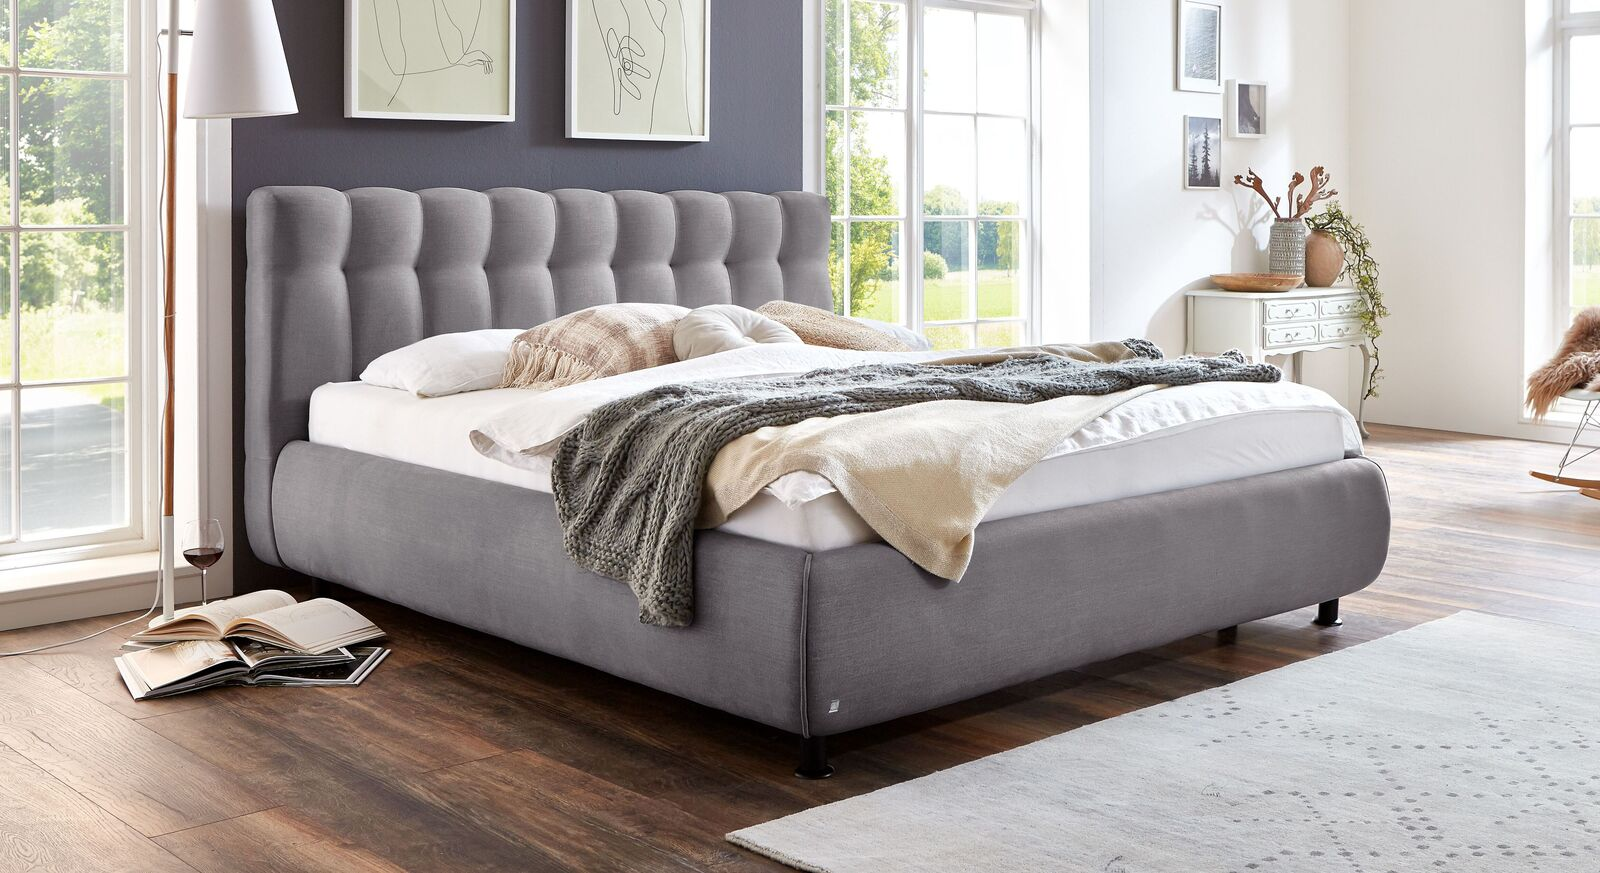 Bett Sumaya mit grauem Stoffbezug